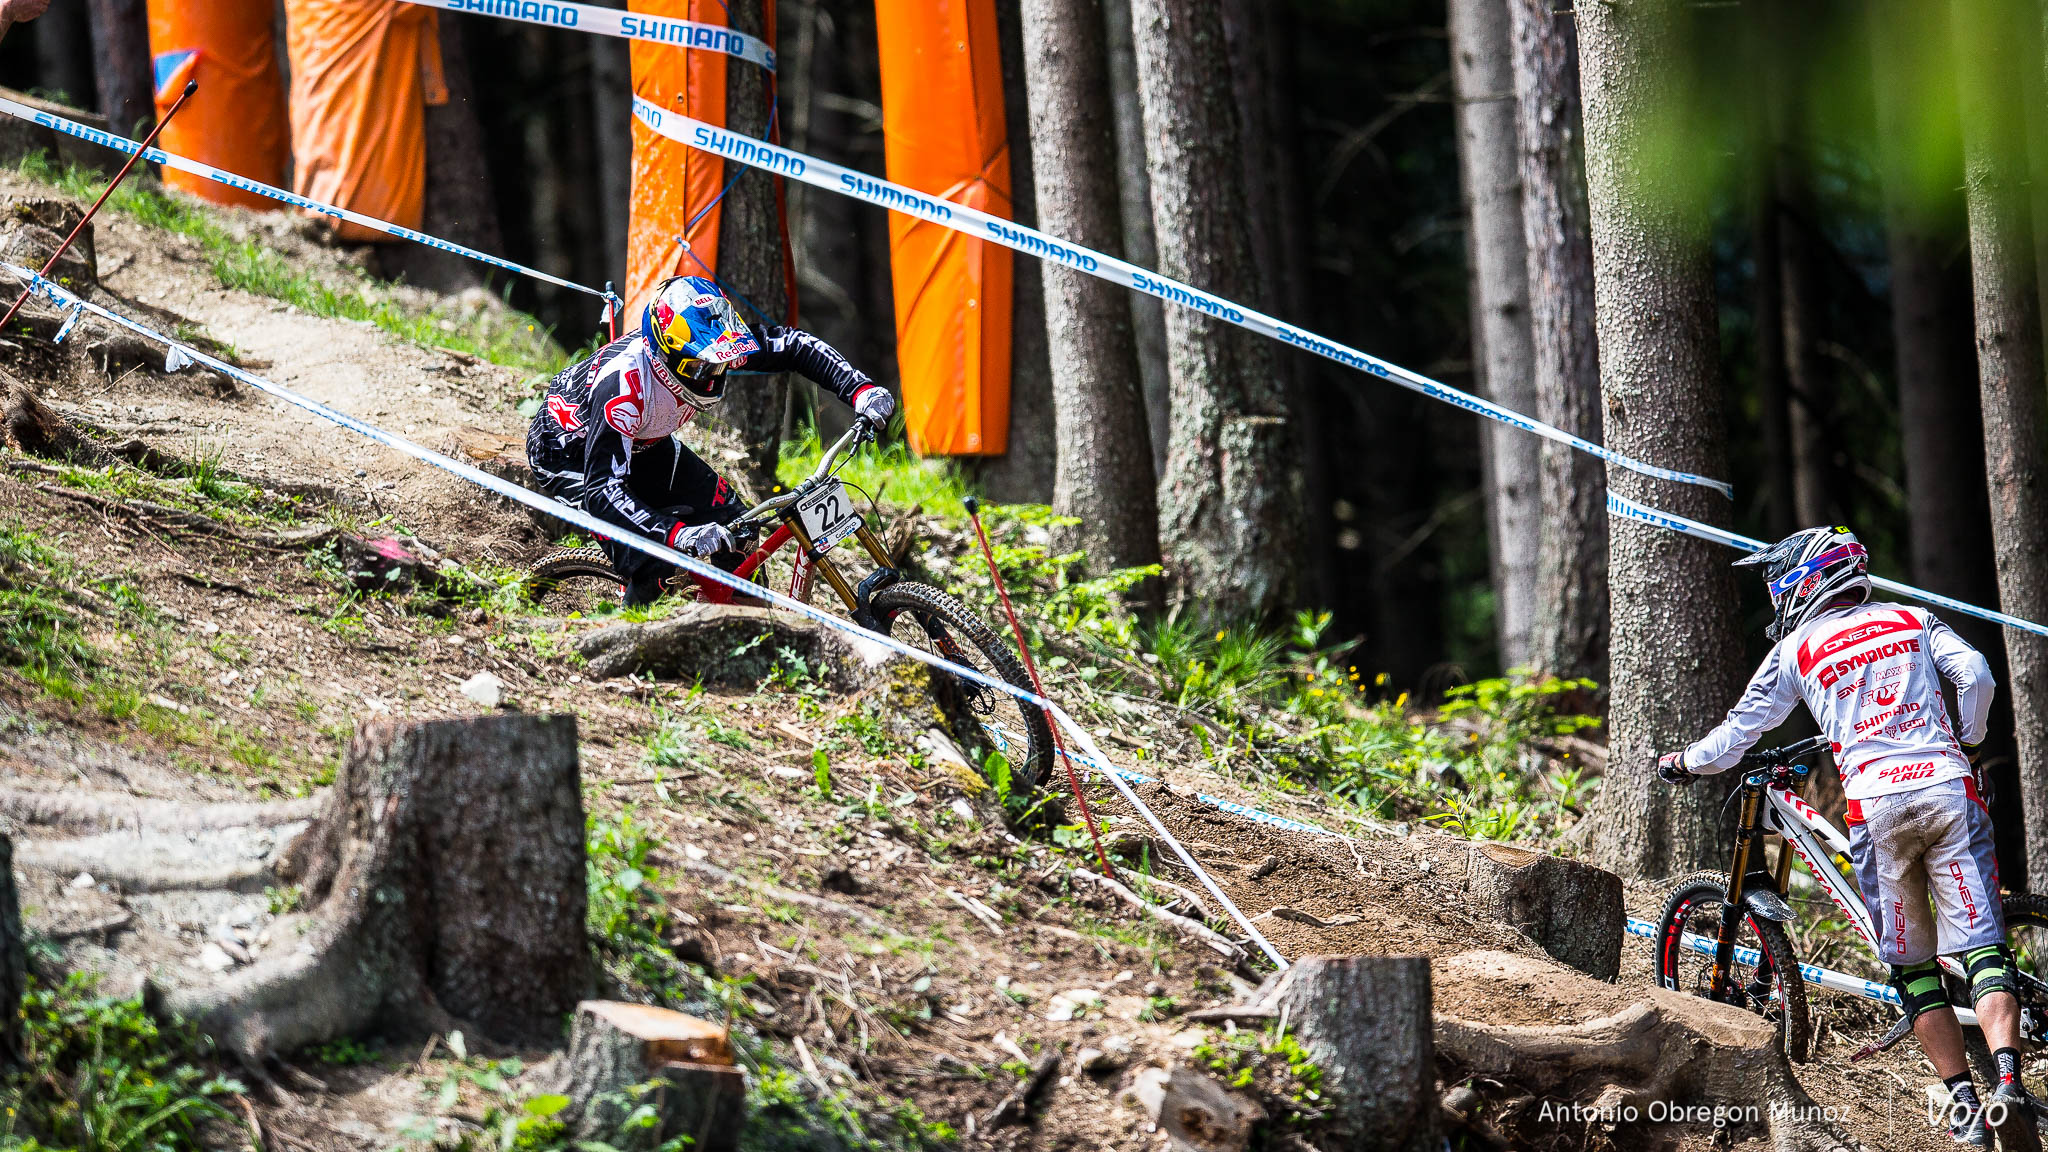 Leogang_UCI_World_Cup_DH_2015_(Porfolio)_(Mcdonald)_(Copyright_Antonio_Obregon_VojoMag-31